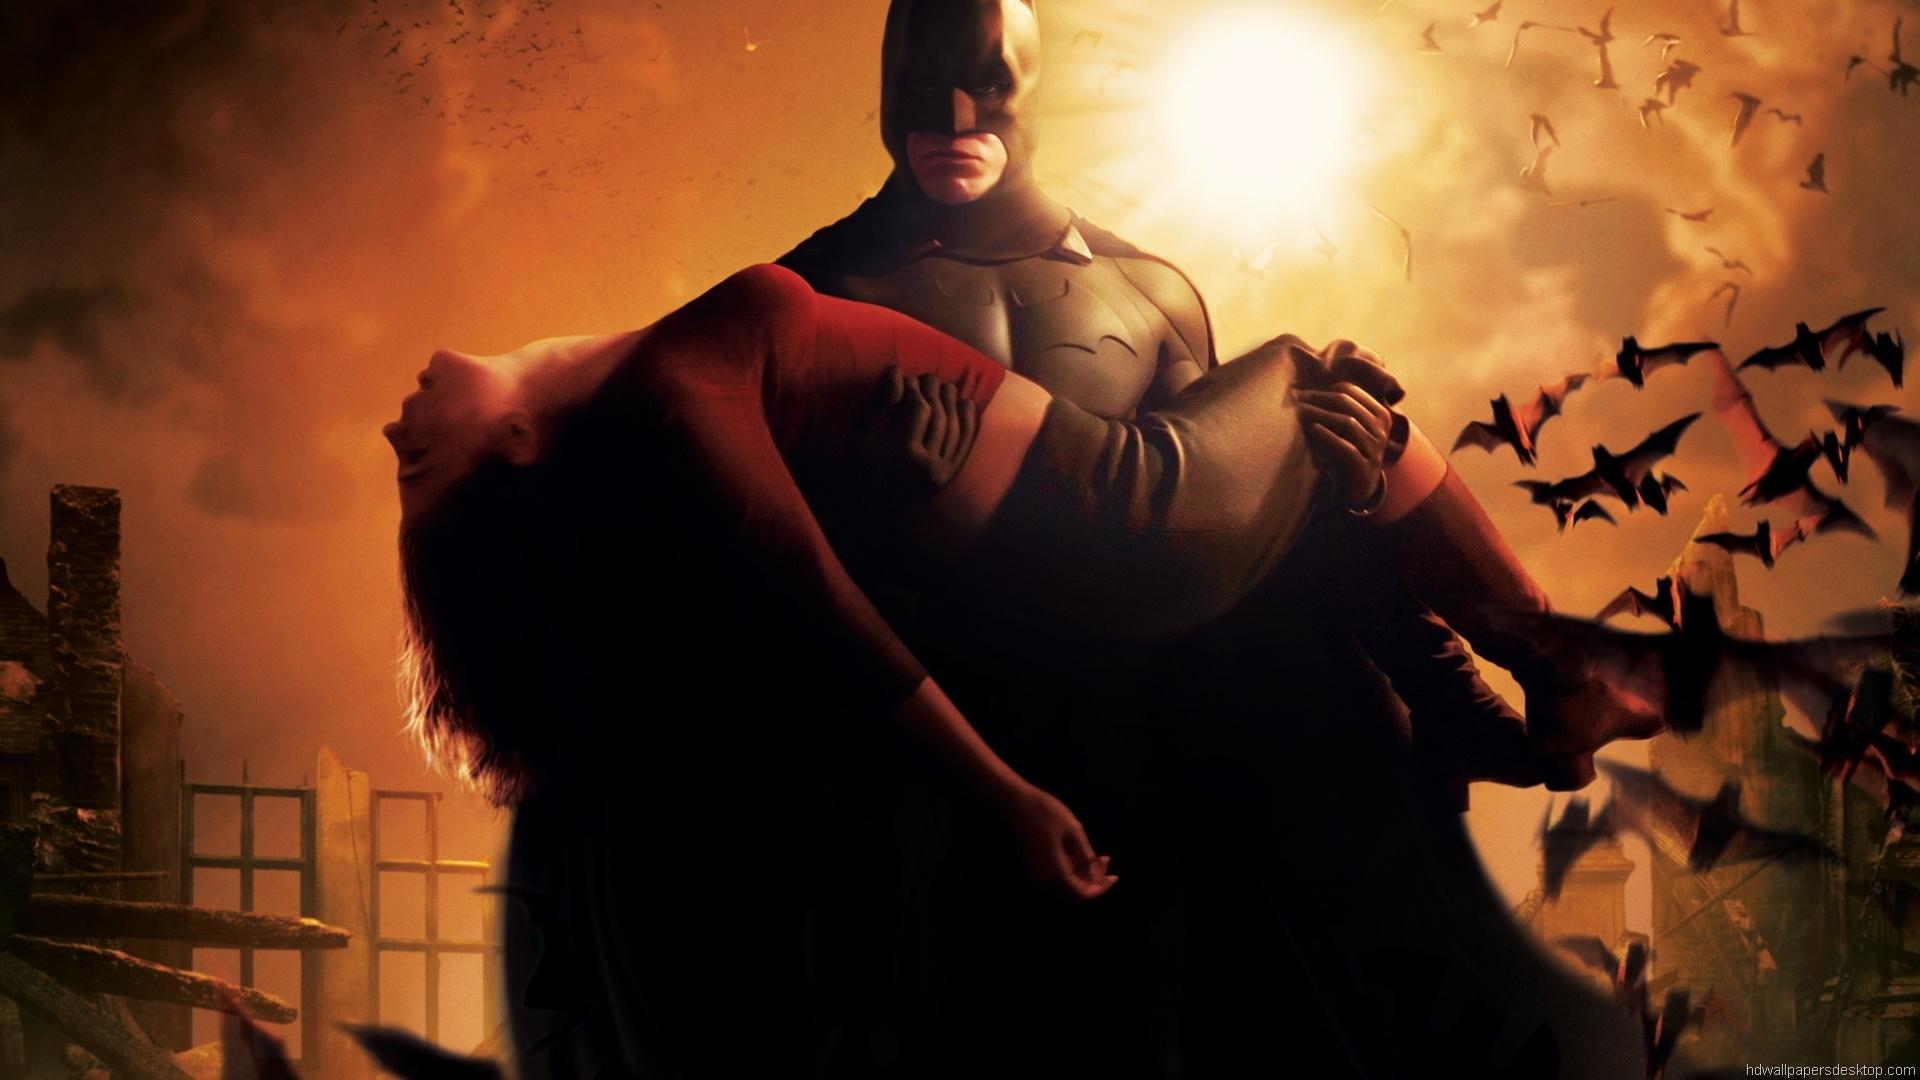 Batman Movie hd Wallpapers 1080p Movie hd Wallpapers Full hd 1920x1080